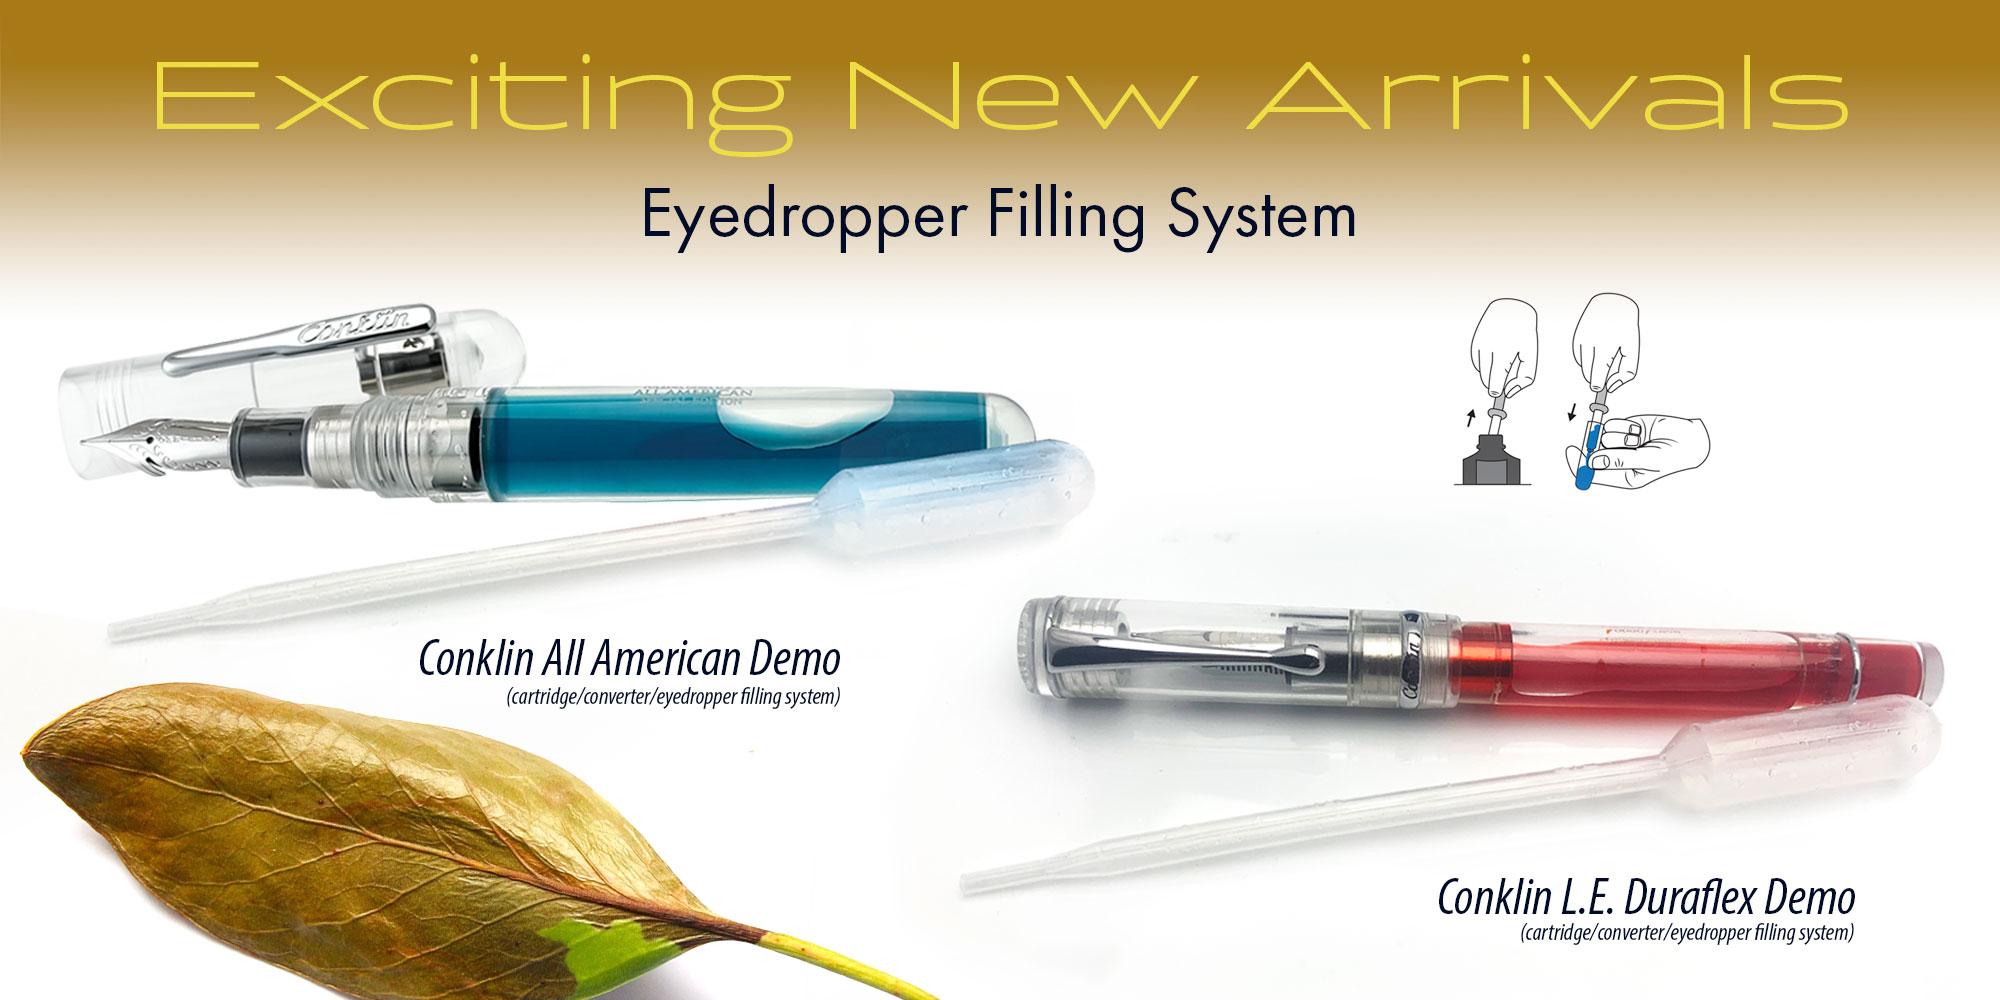 conklin-eyedropper-system-banner.jpg